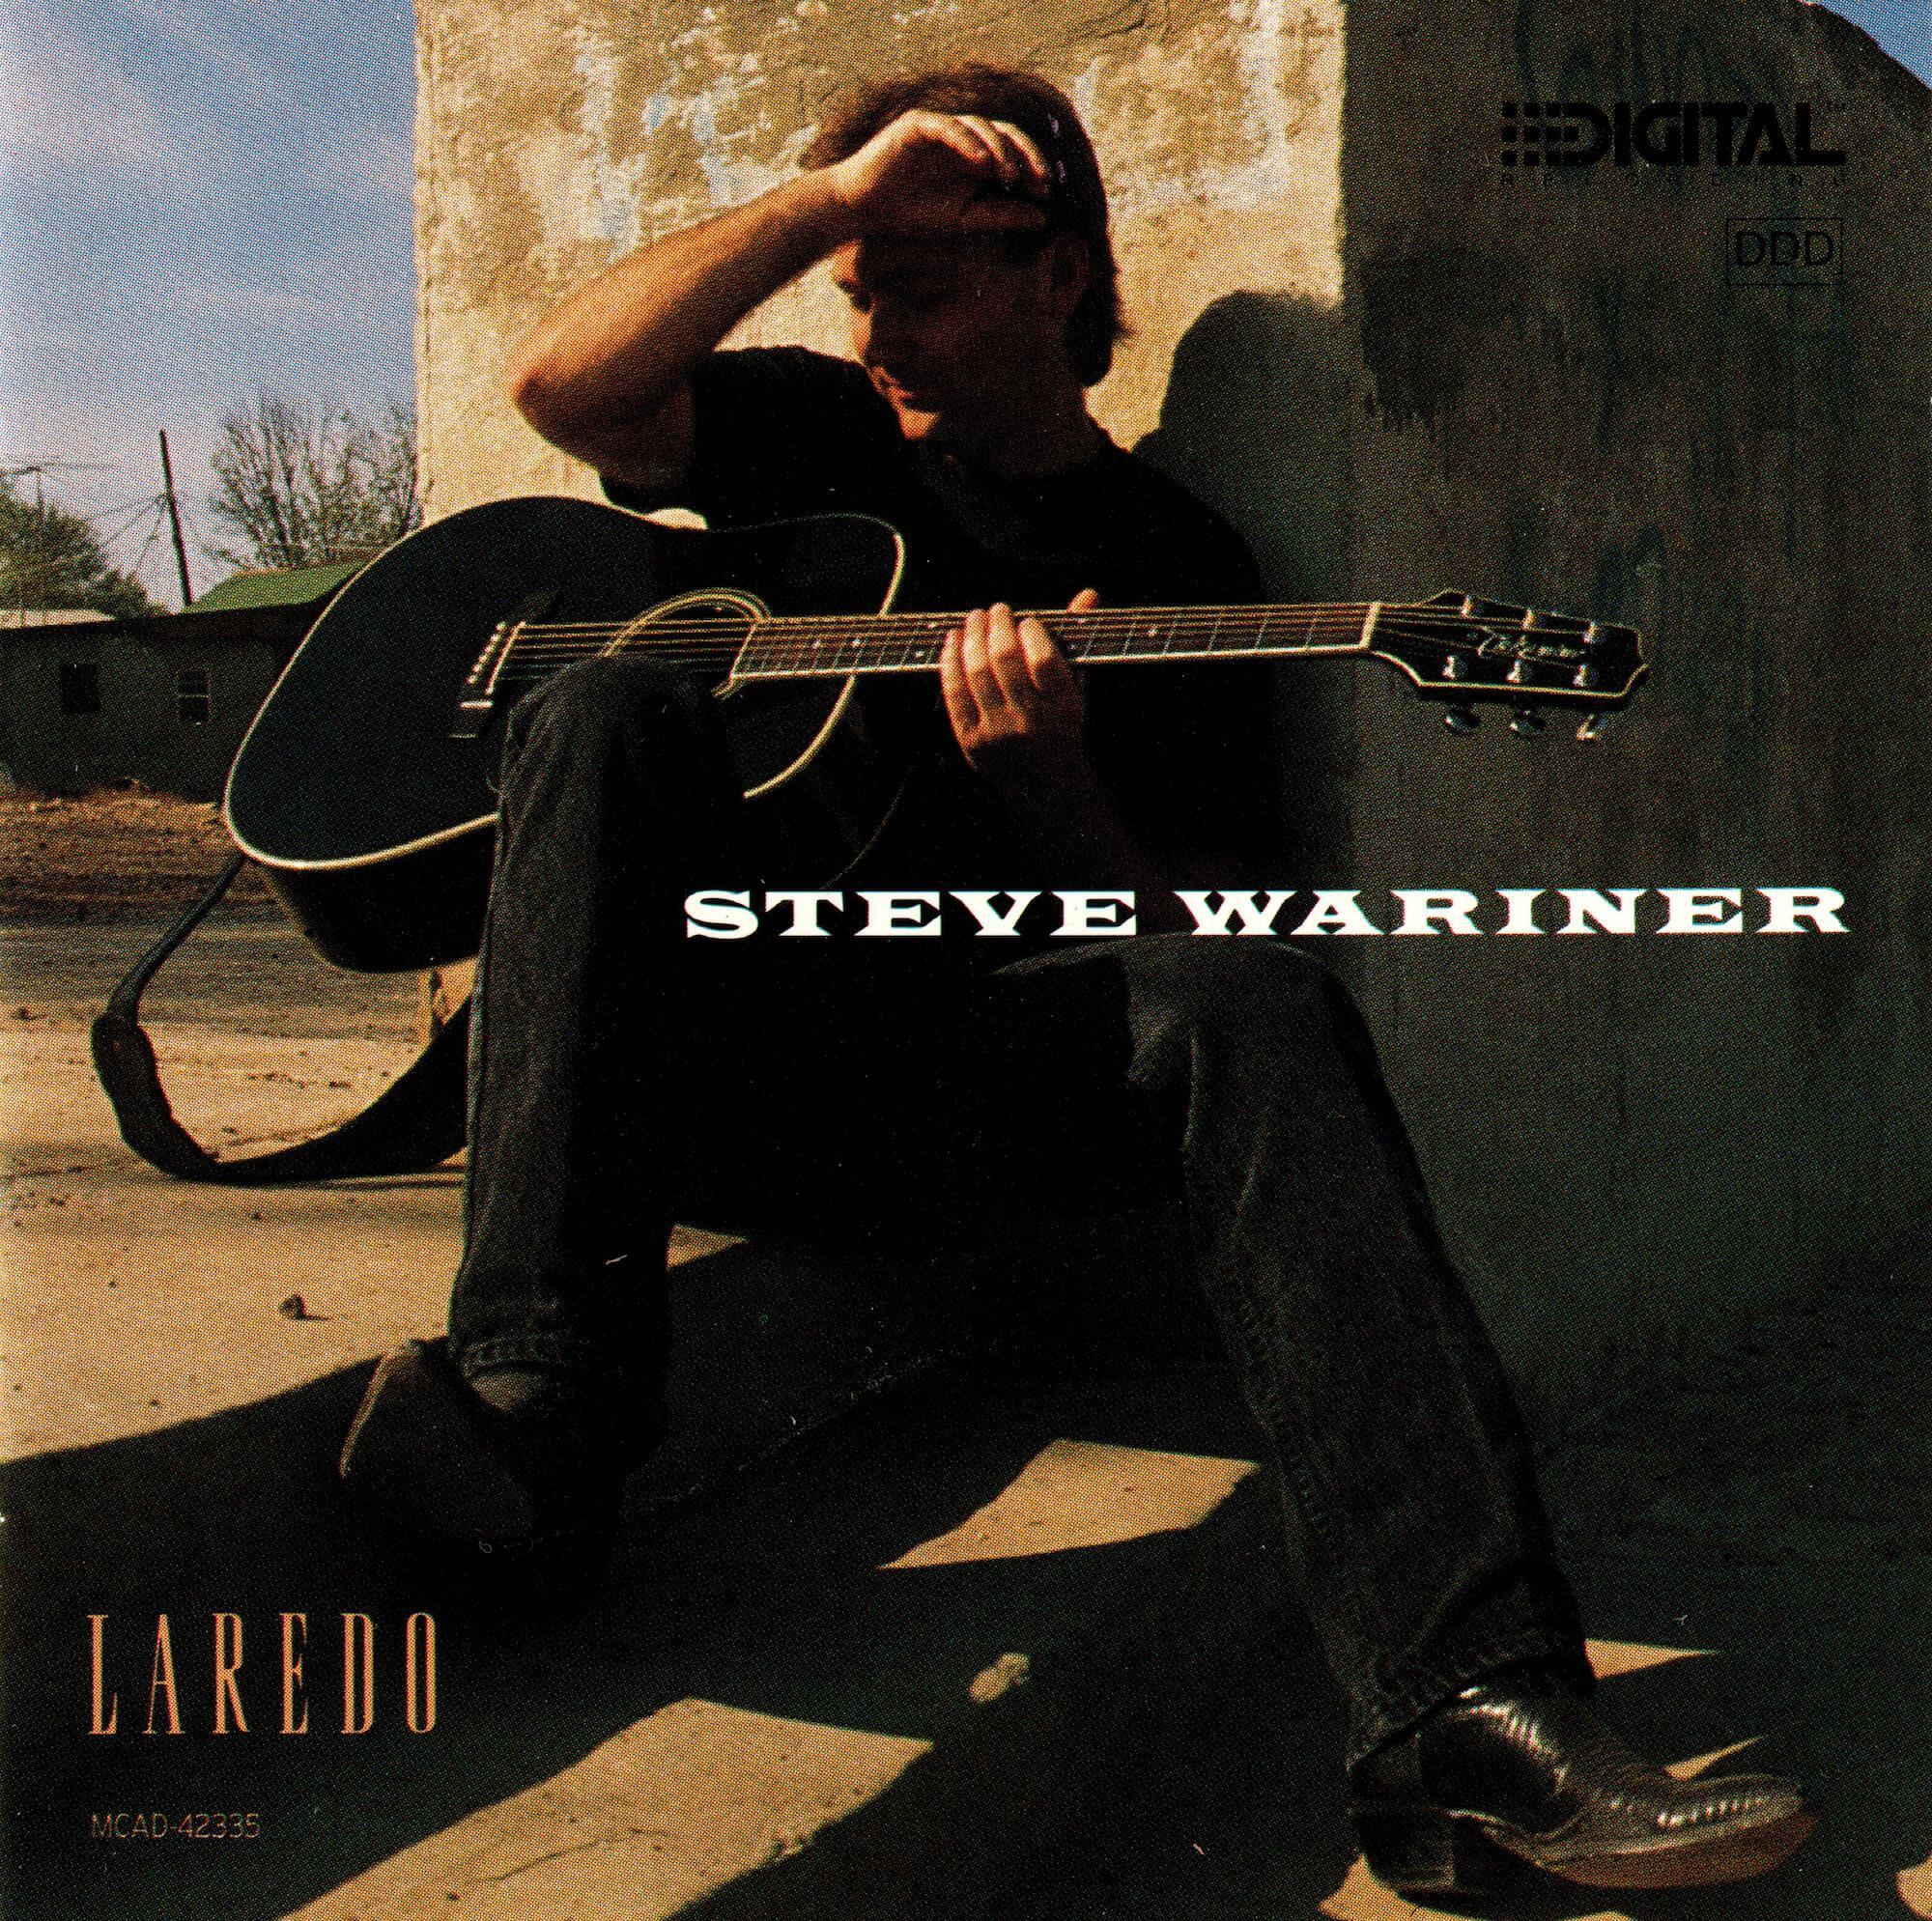 Laredo - Steve Wariner .jpeg